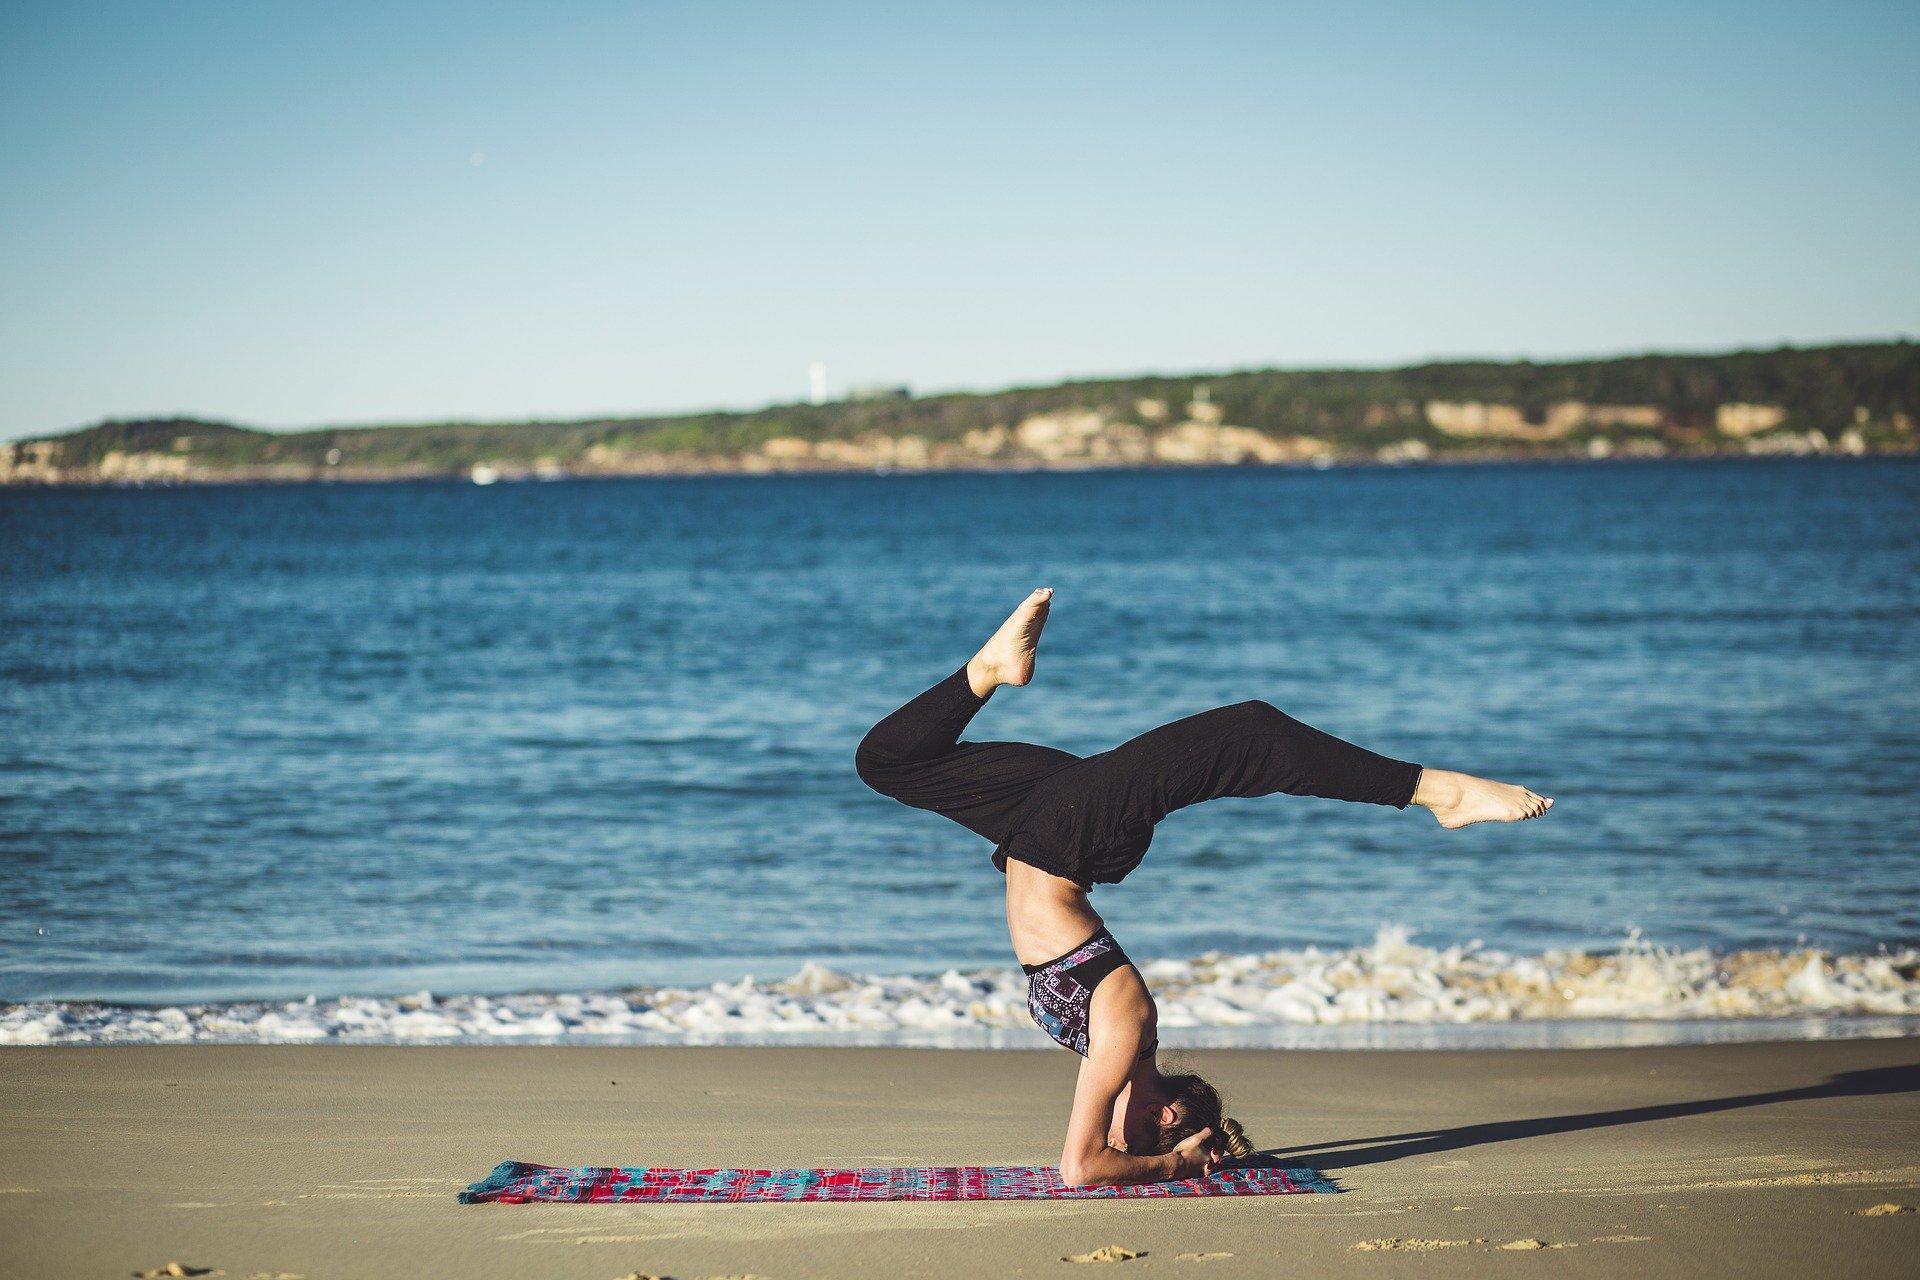 Asana Sobre la cabeza, el pino, yoga en la playa